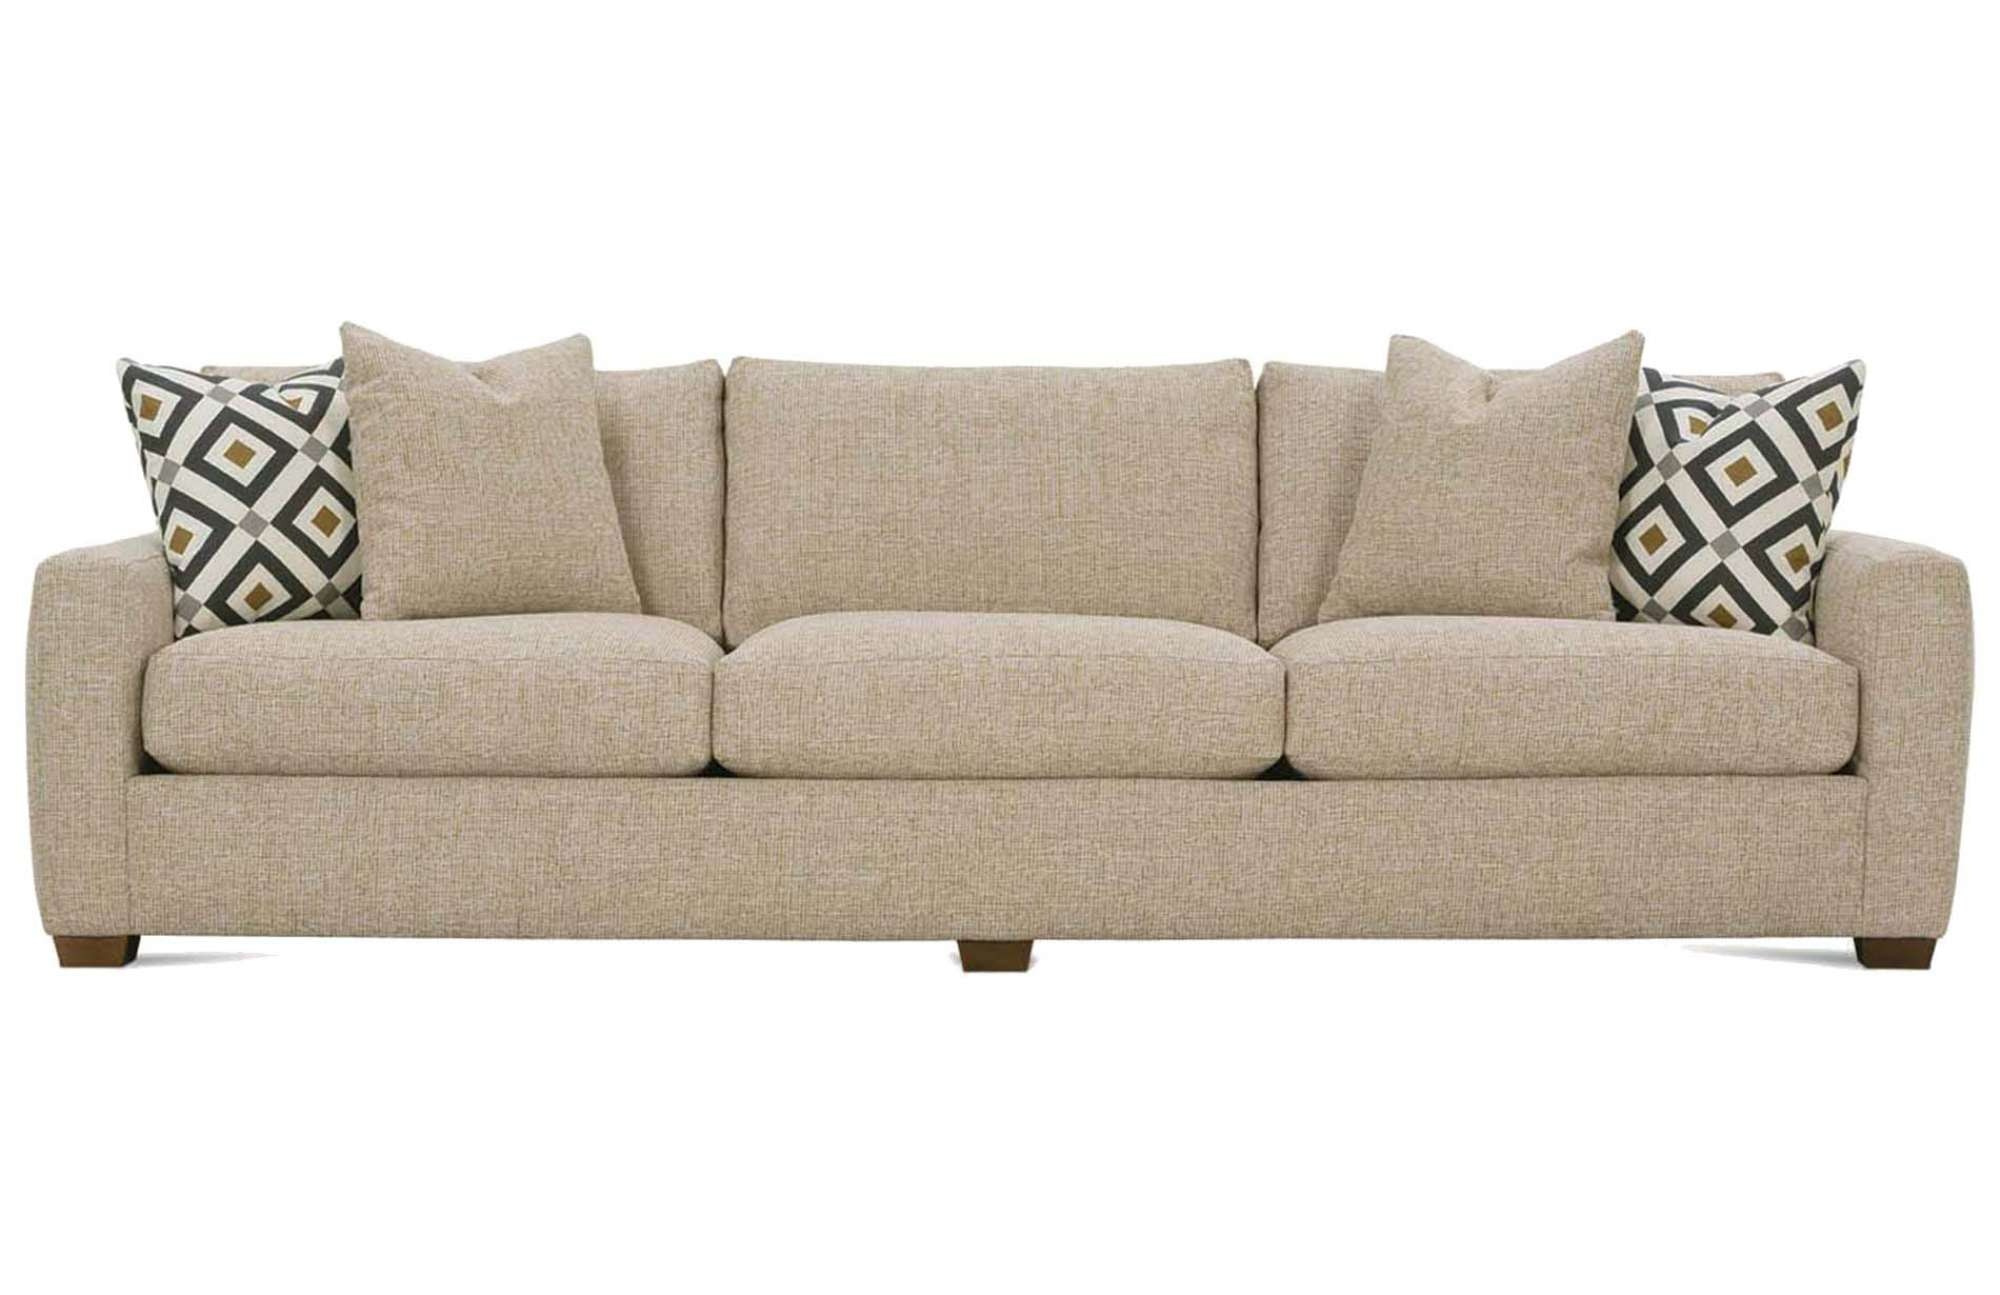 Good Robin Bruce Catalog Robin Bruce Brynne Sofa By Hickory Park Furniture  Galleries Brynne 040